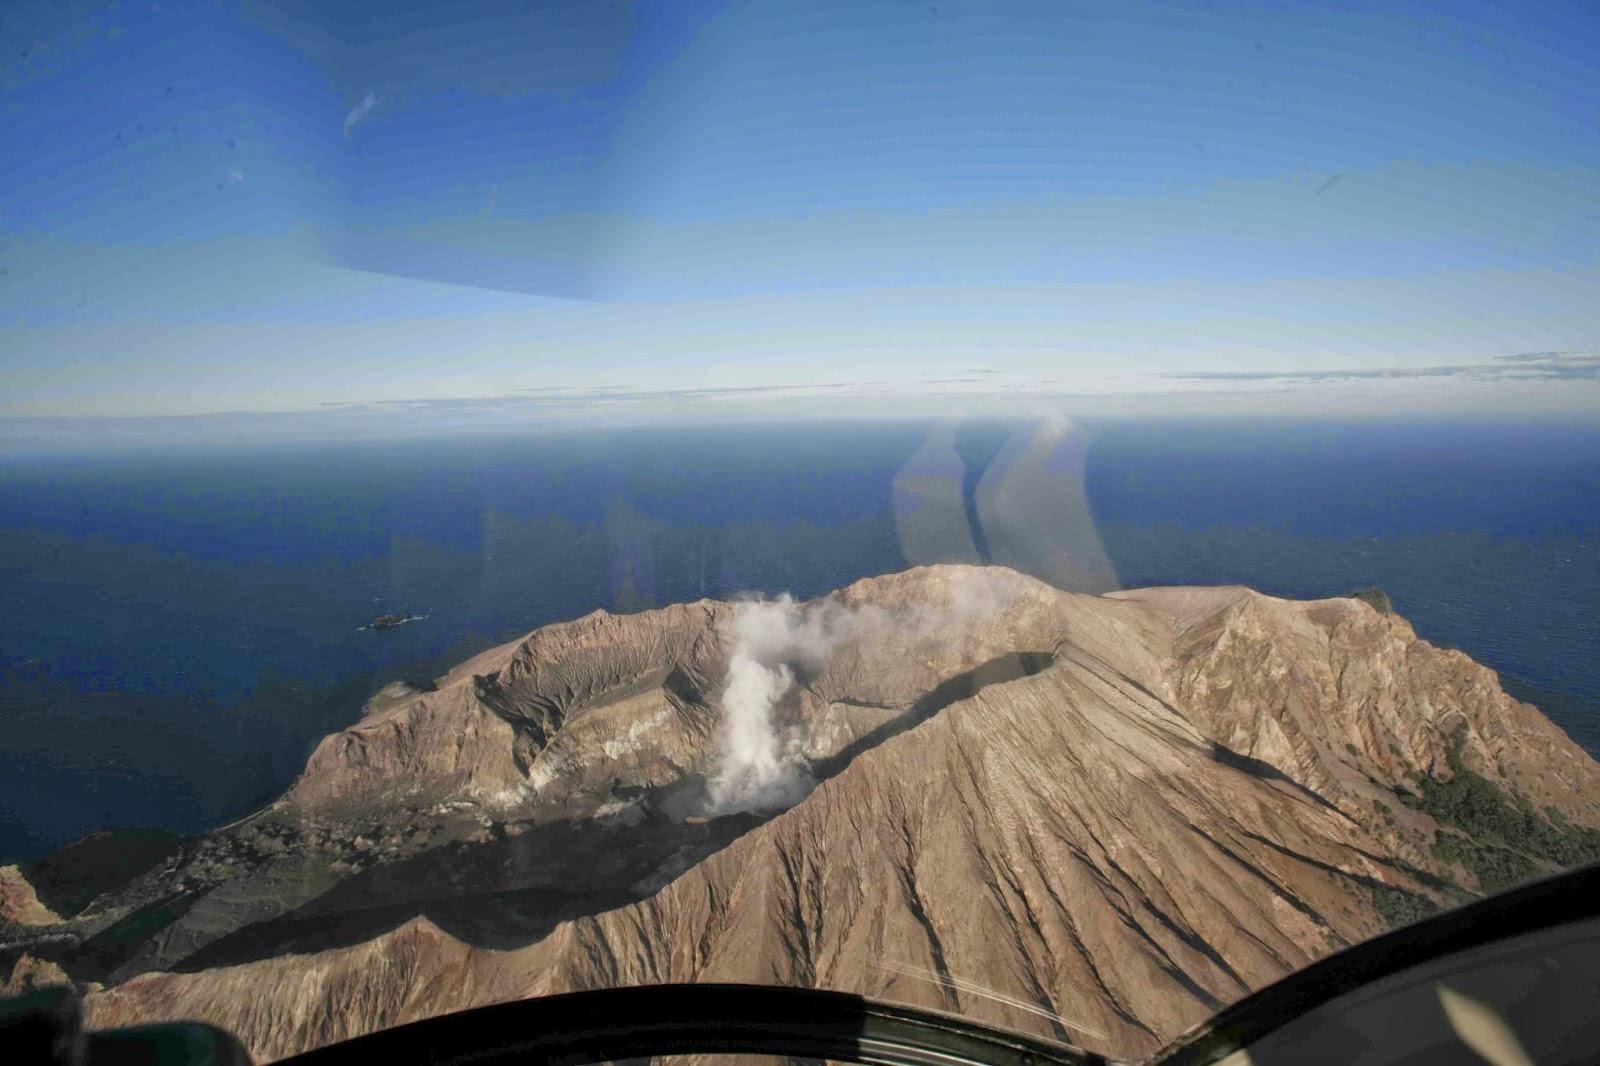 Walter Kei 水哥旅遊: 紐西蘭 - 懷特島(White Island)生命再新